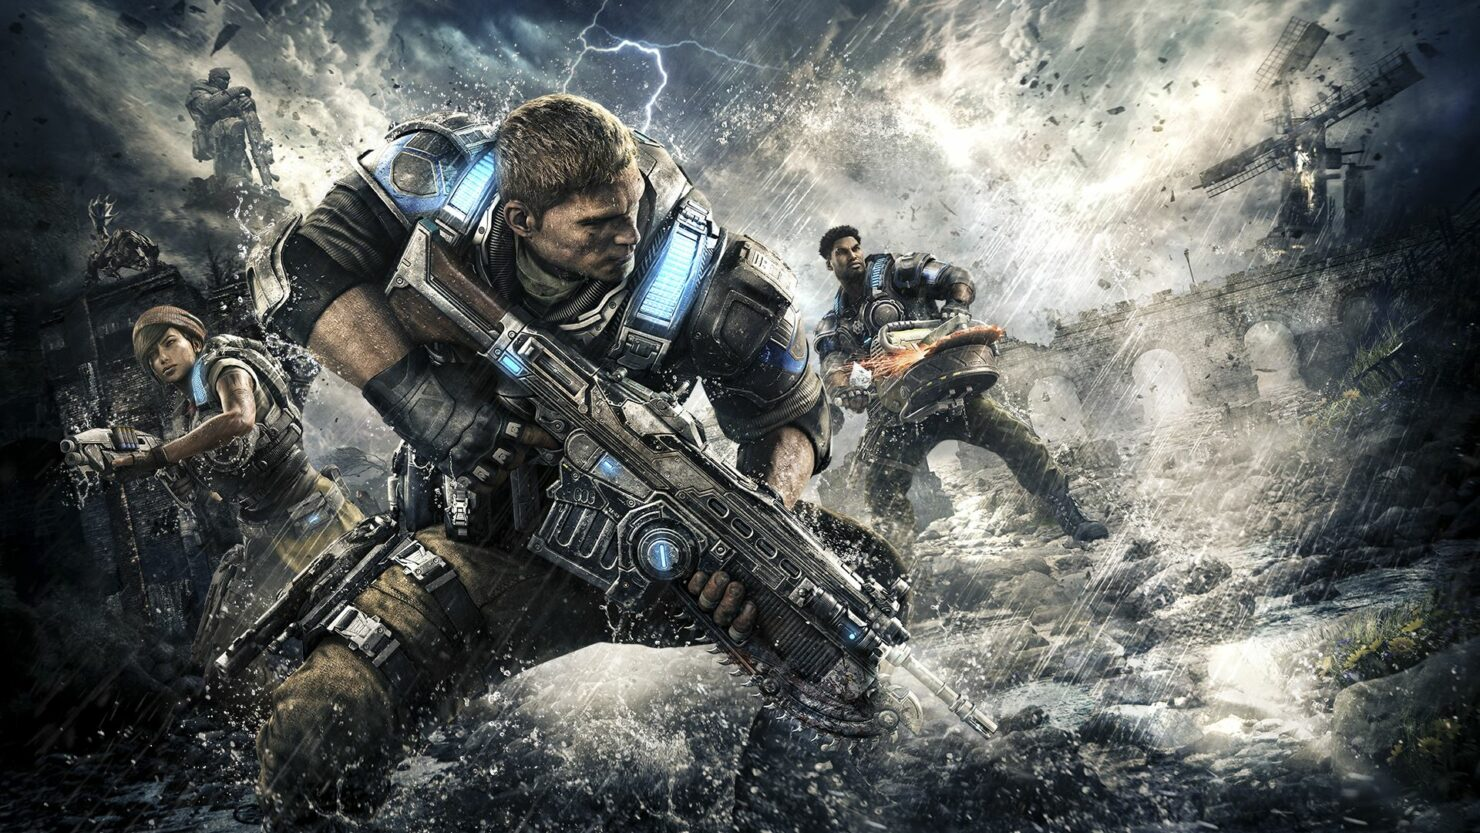 Gears Of War 4 update